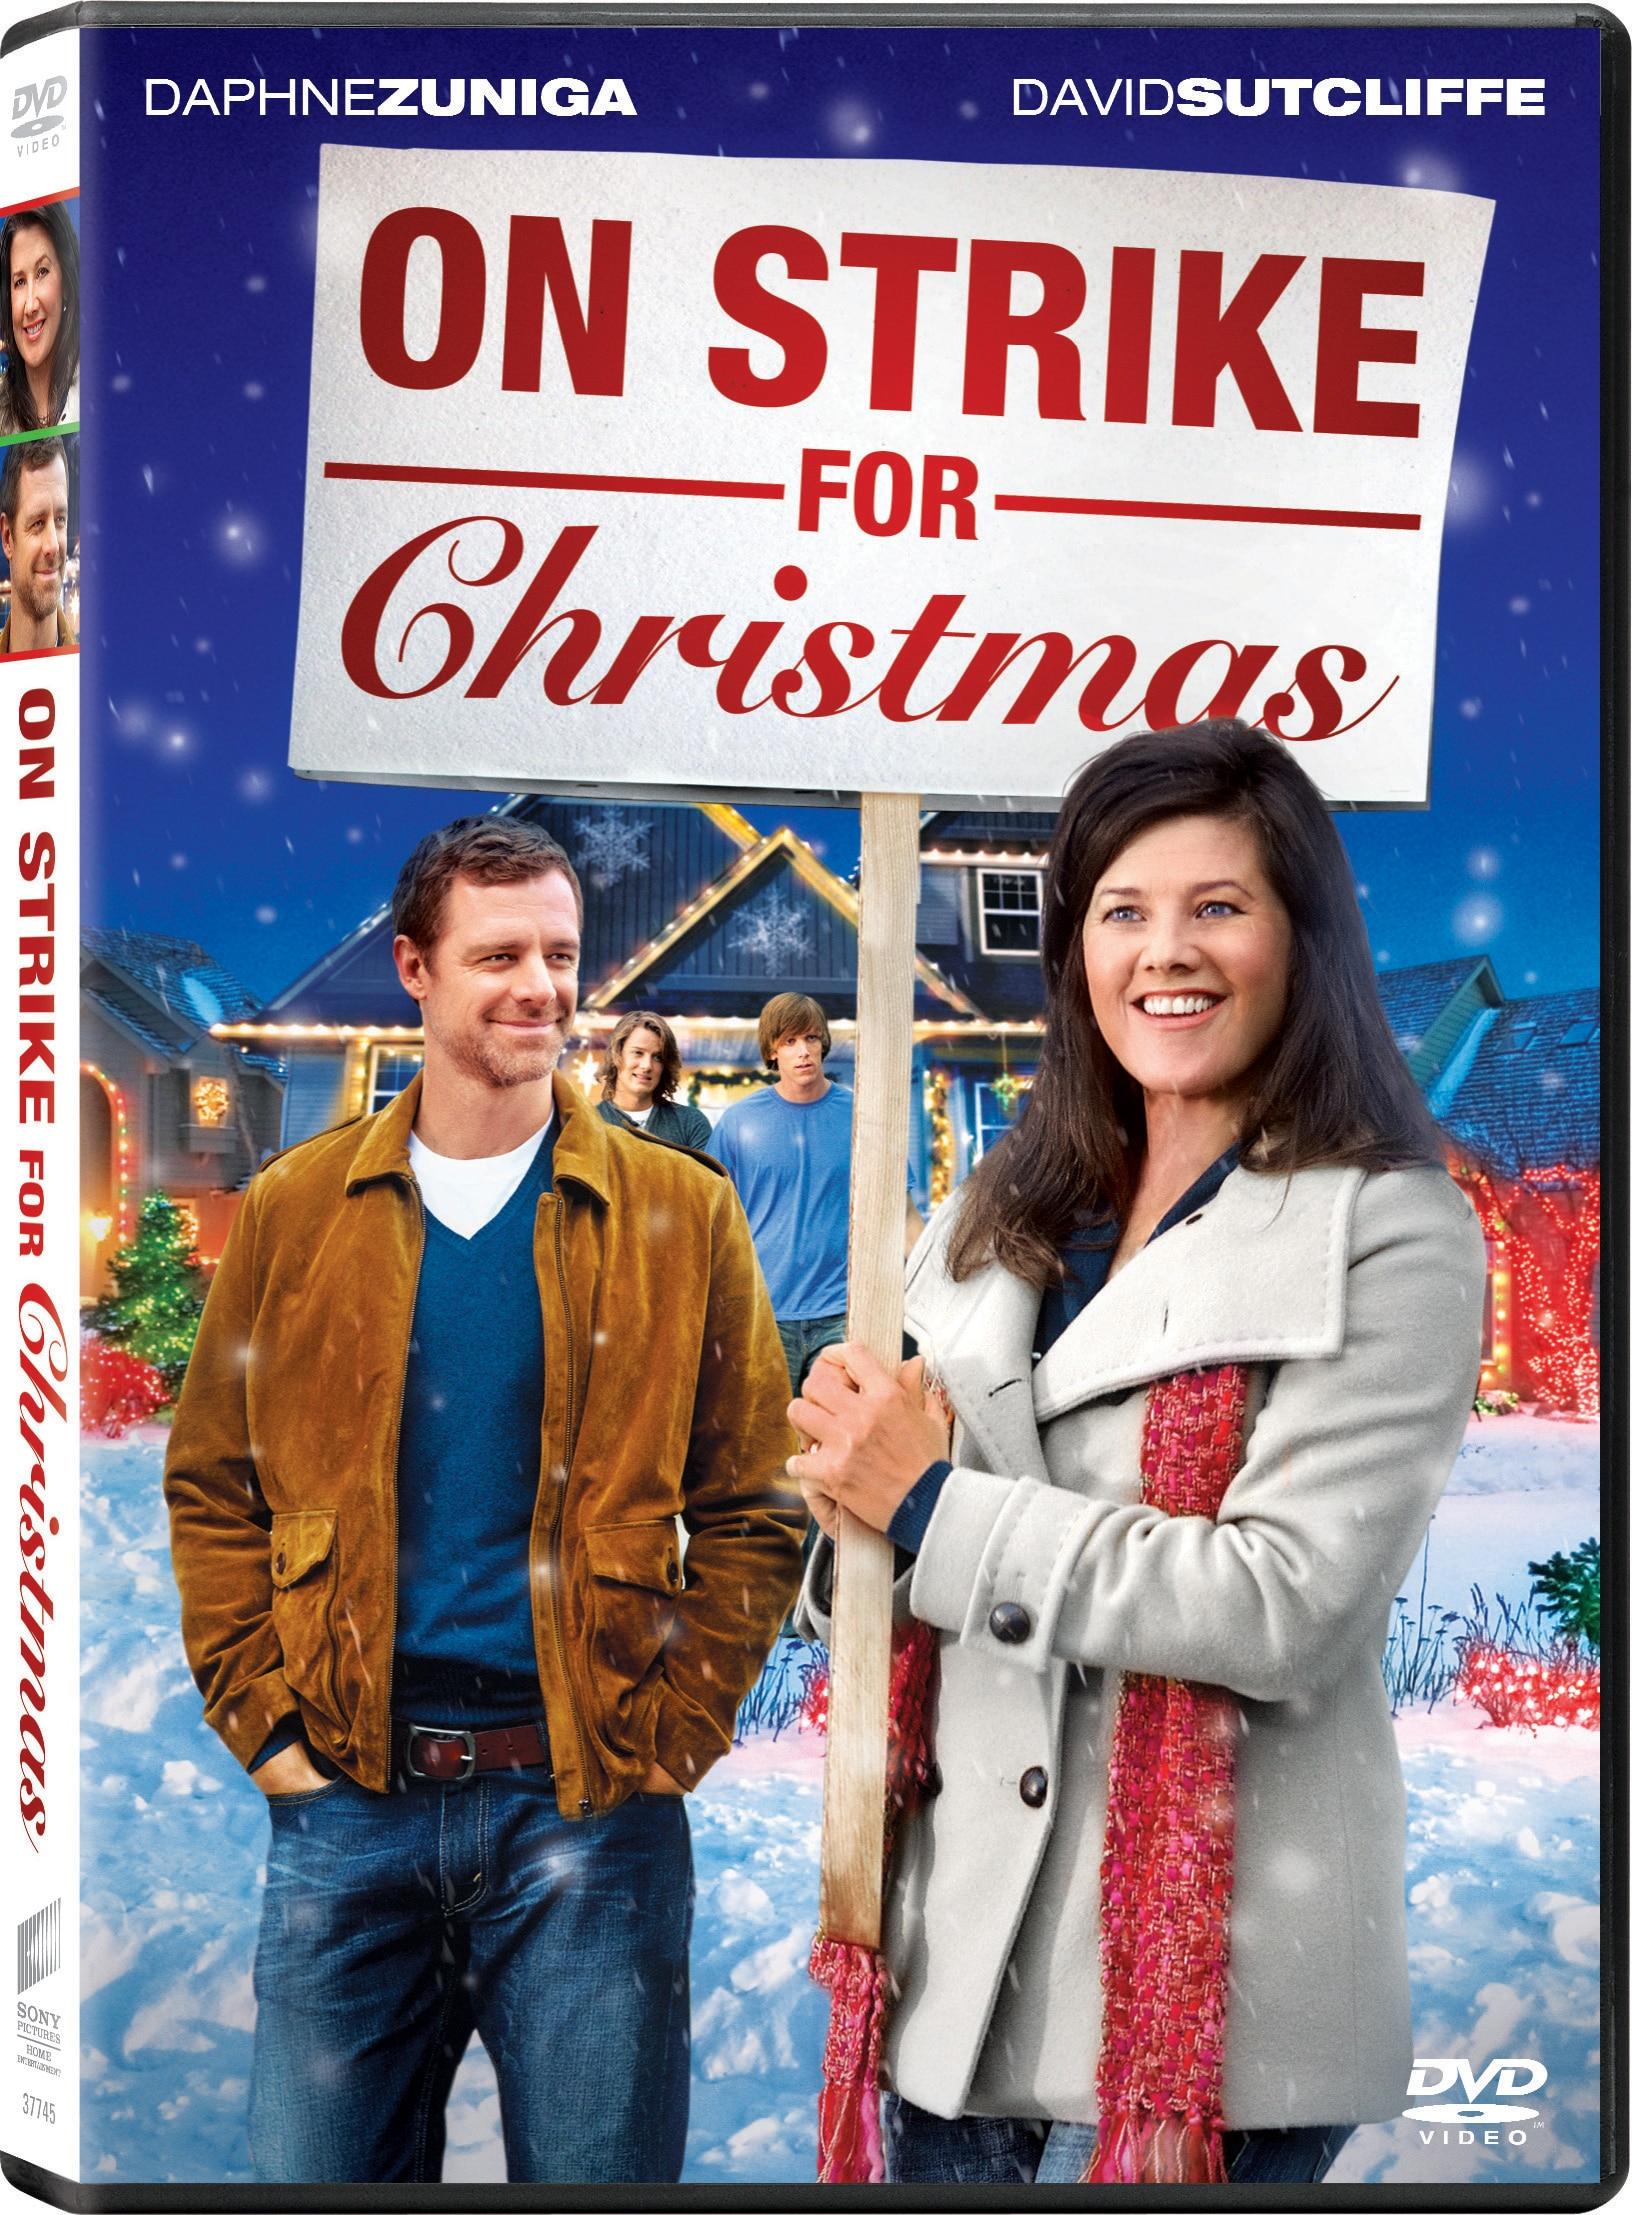 On Strike for Christmas (DVD)